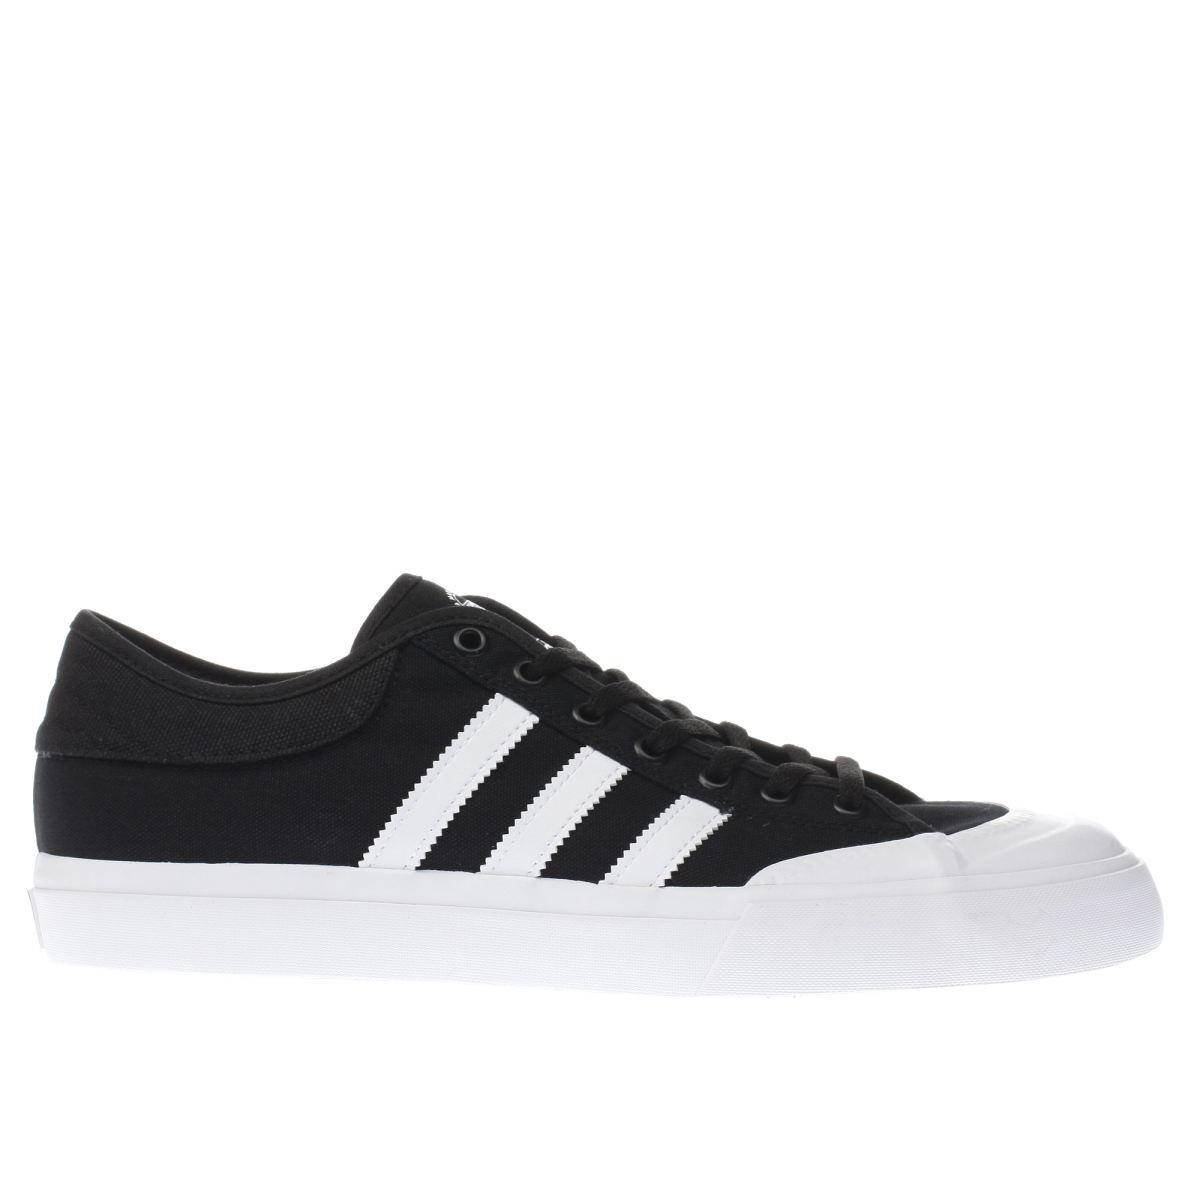 adidas-matchcourt-black-and-white-trainers